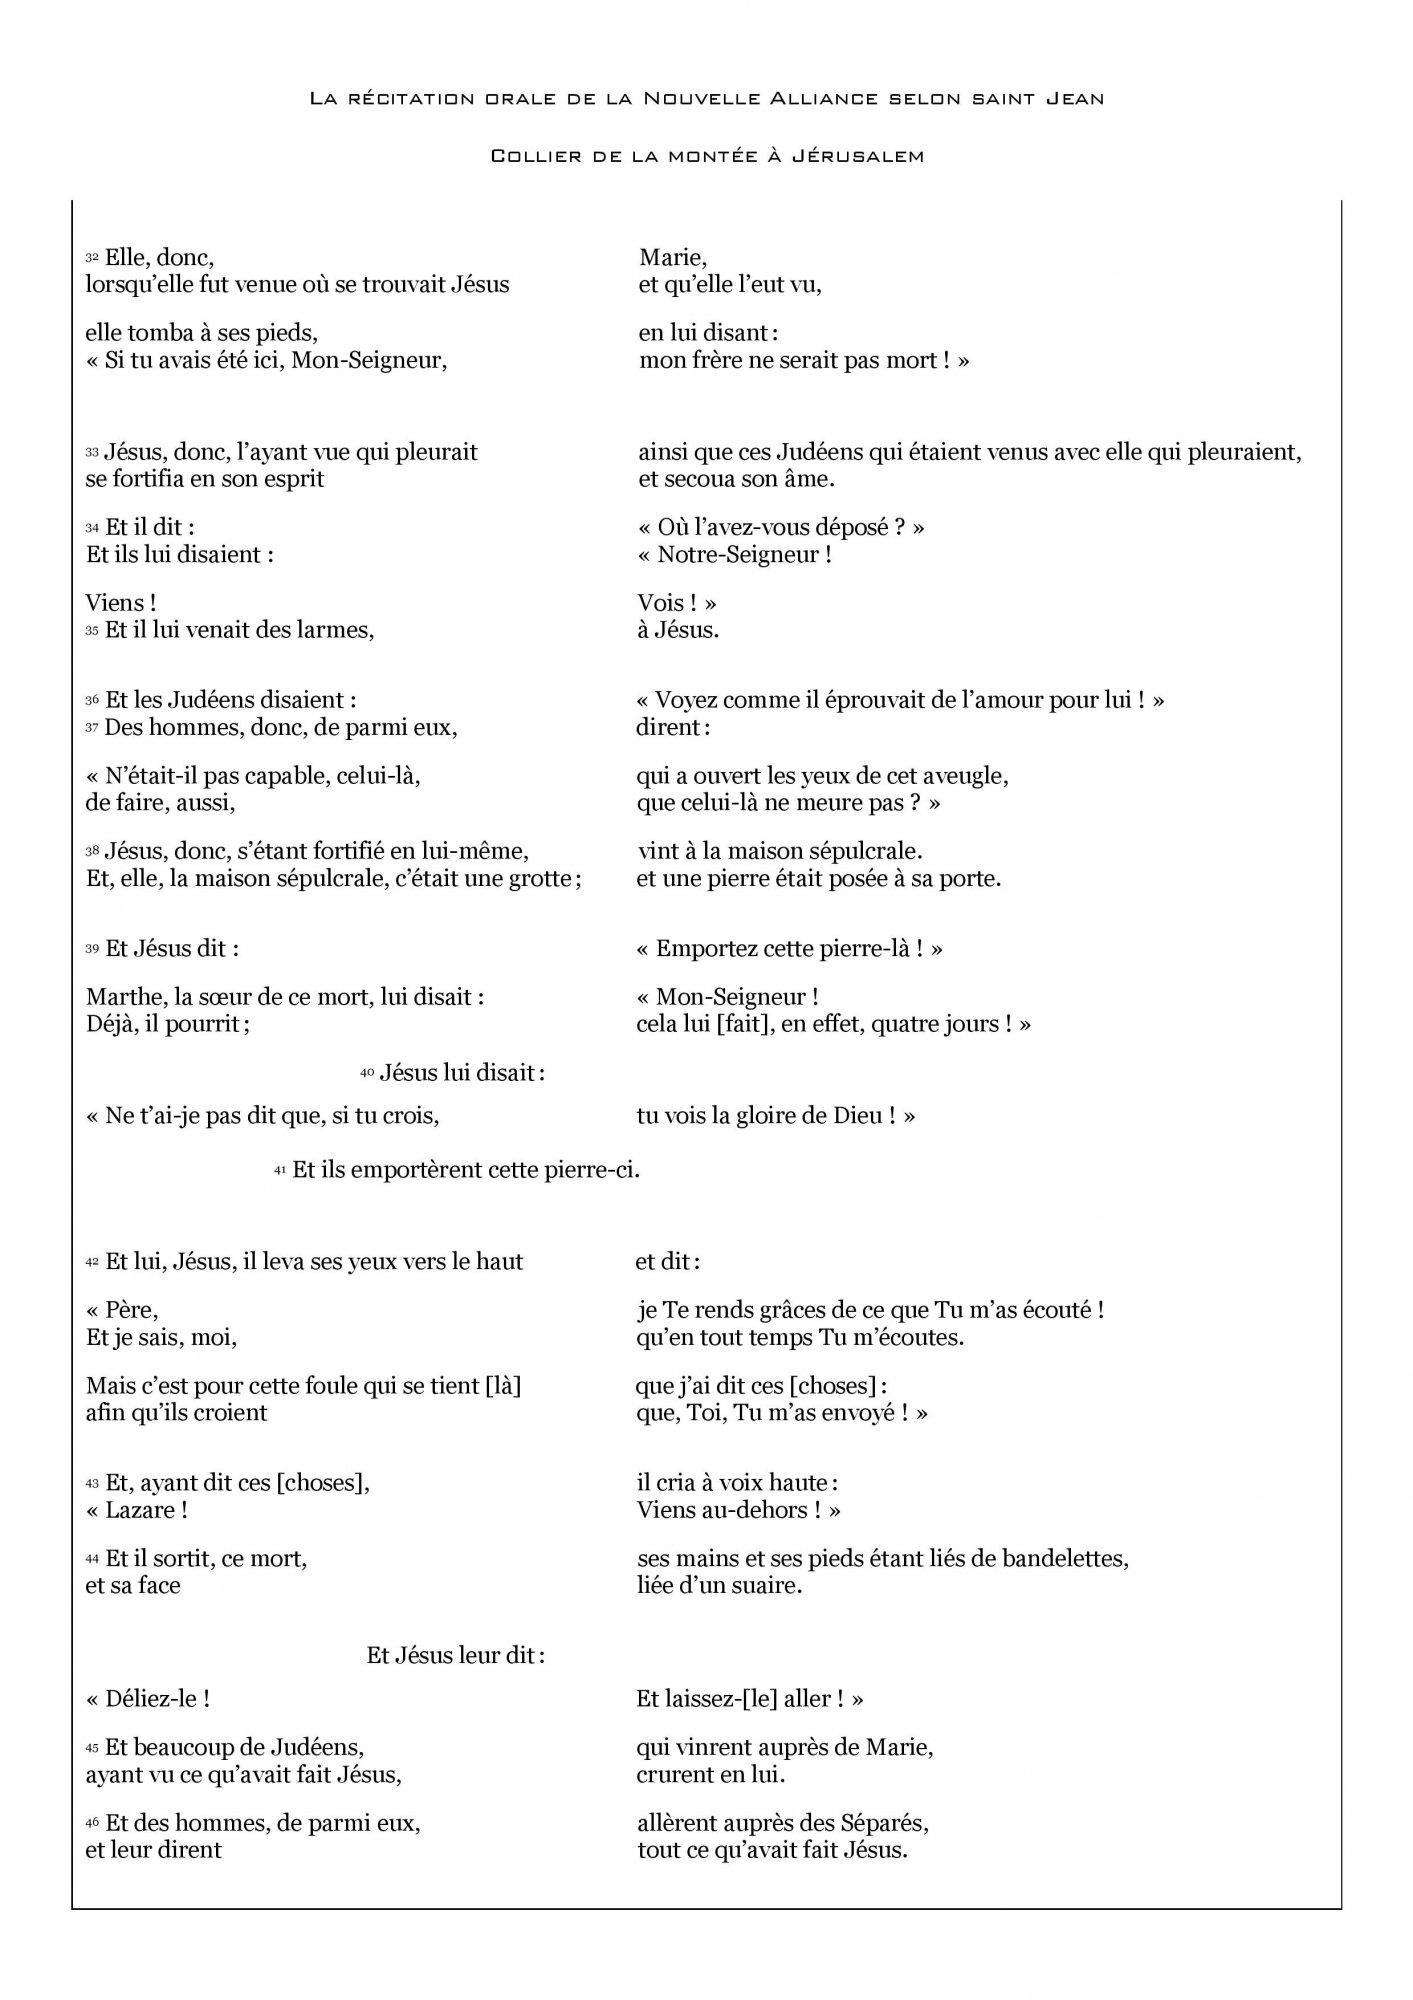 111407-la-reanimation-de-lazare-5e-dimanche-de-careme-annee-a